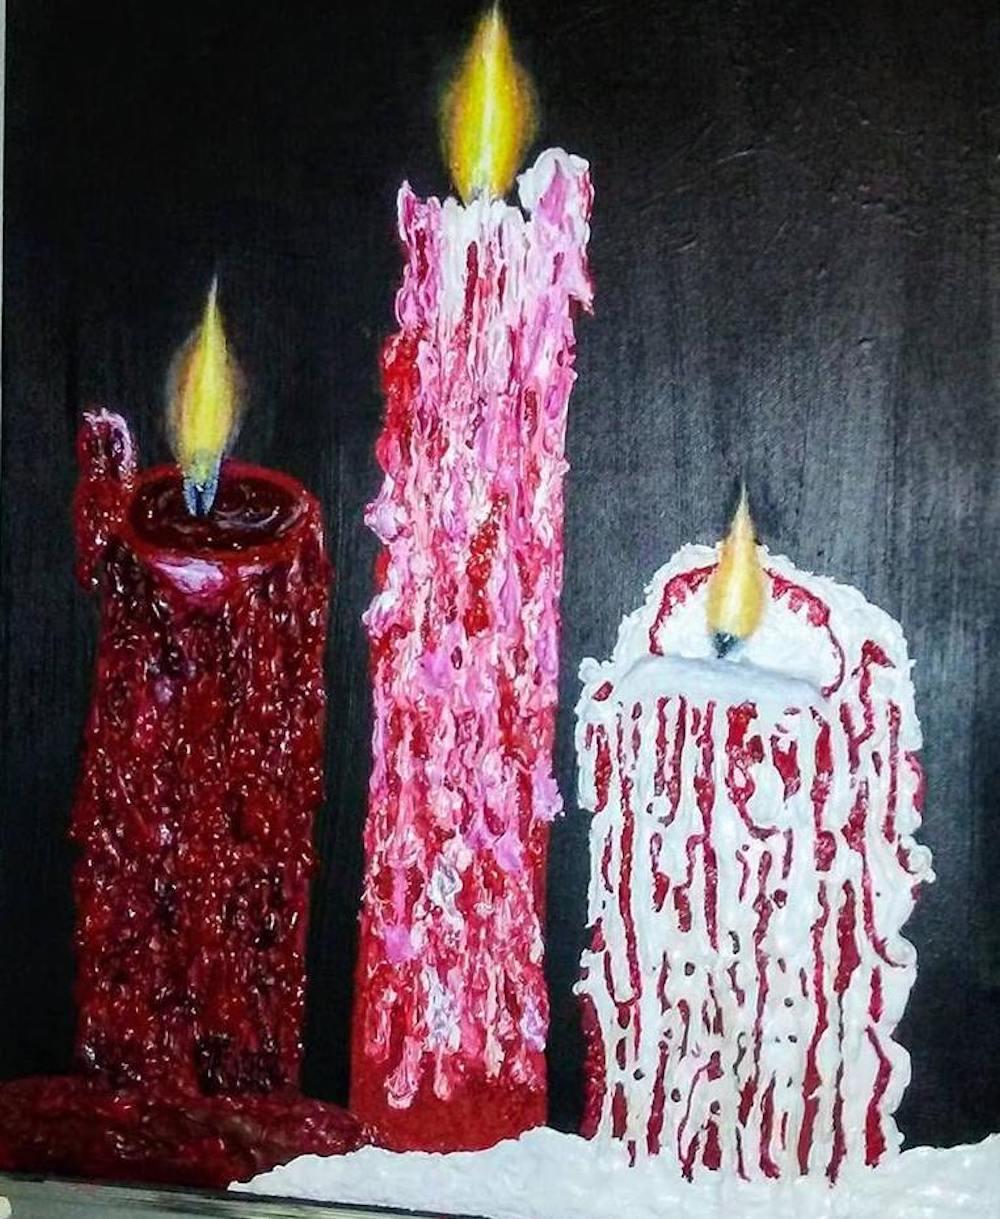 Incandescence,Cynthia R. Copeland